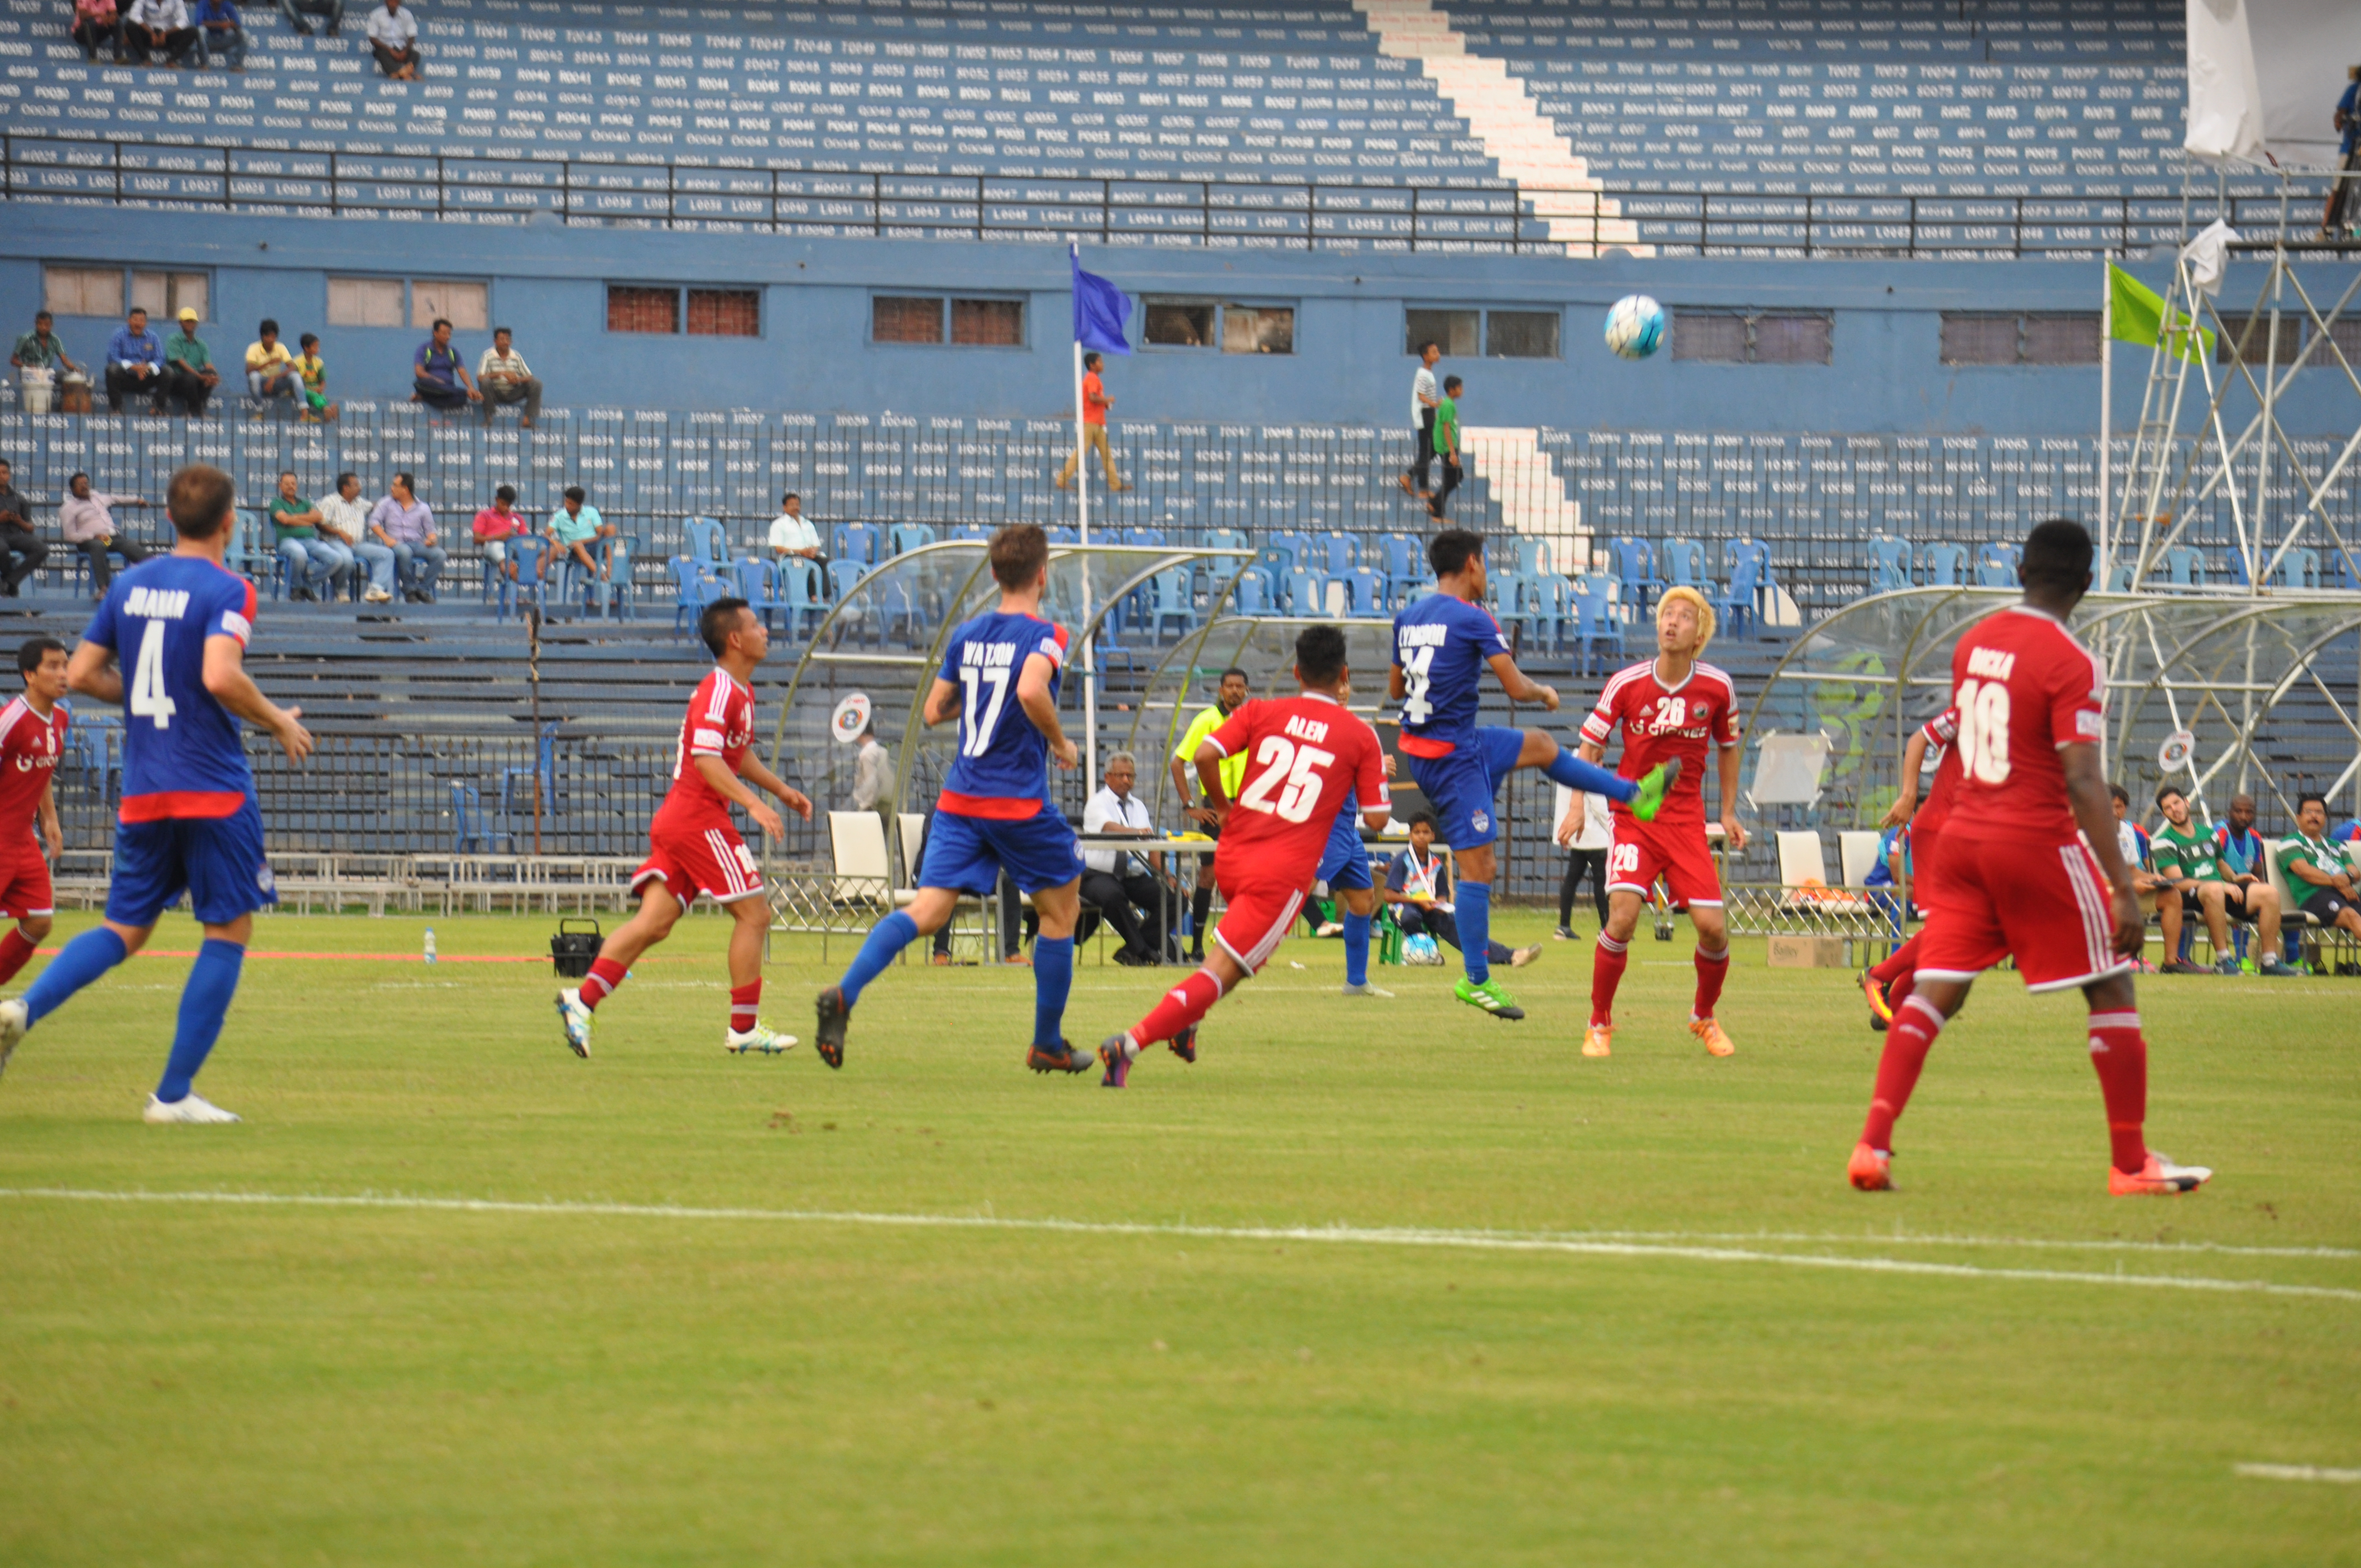 FIFA president congratulates Aizawl FC on I-League win